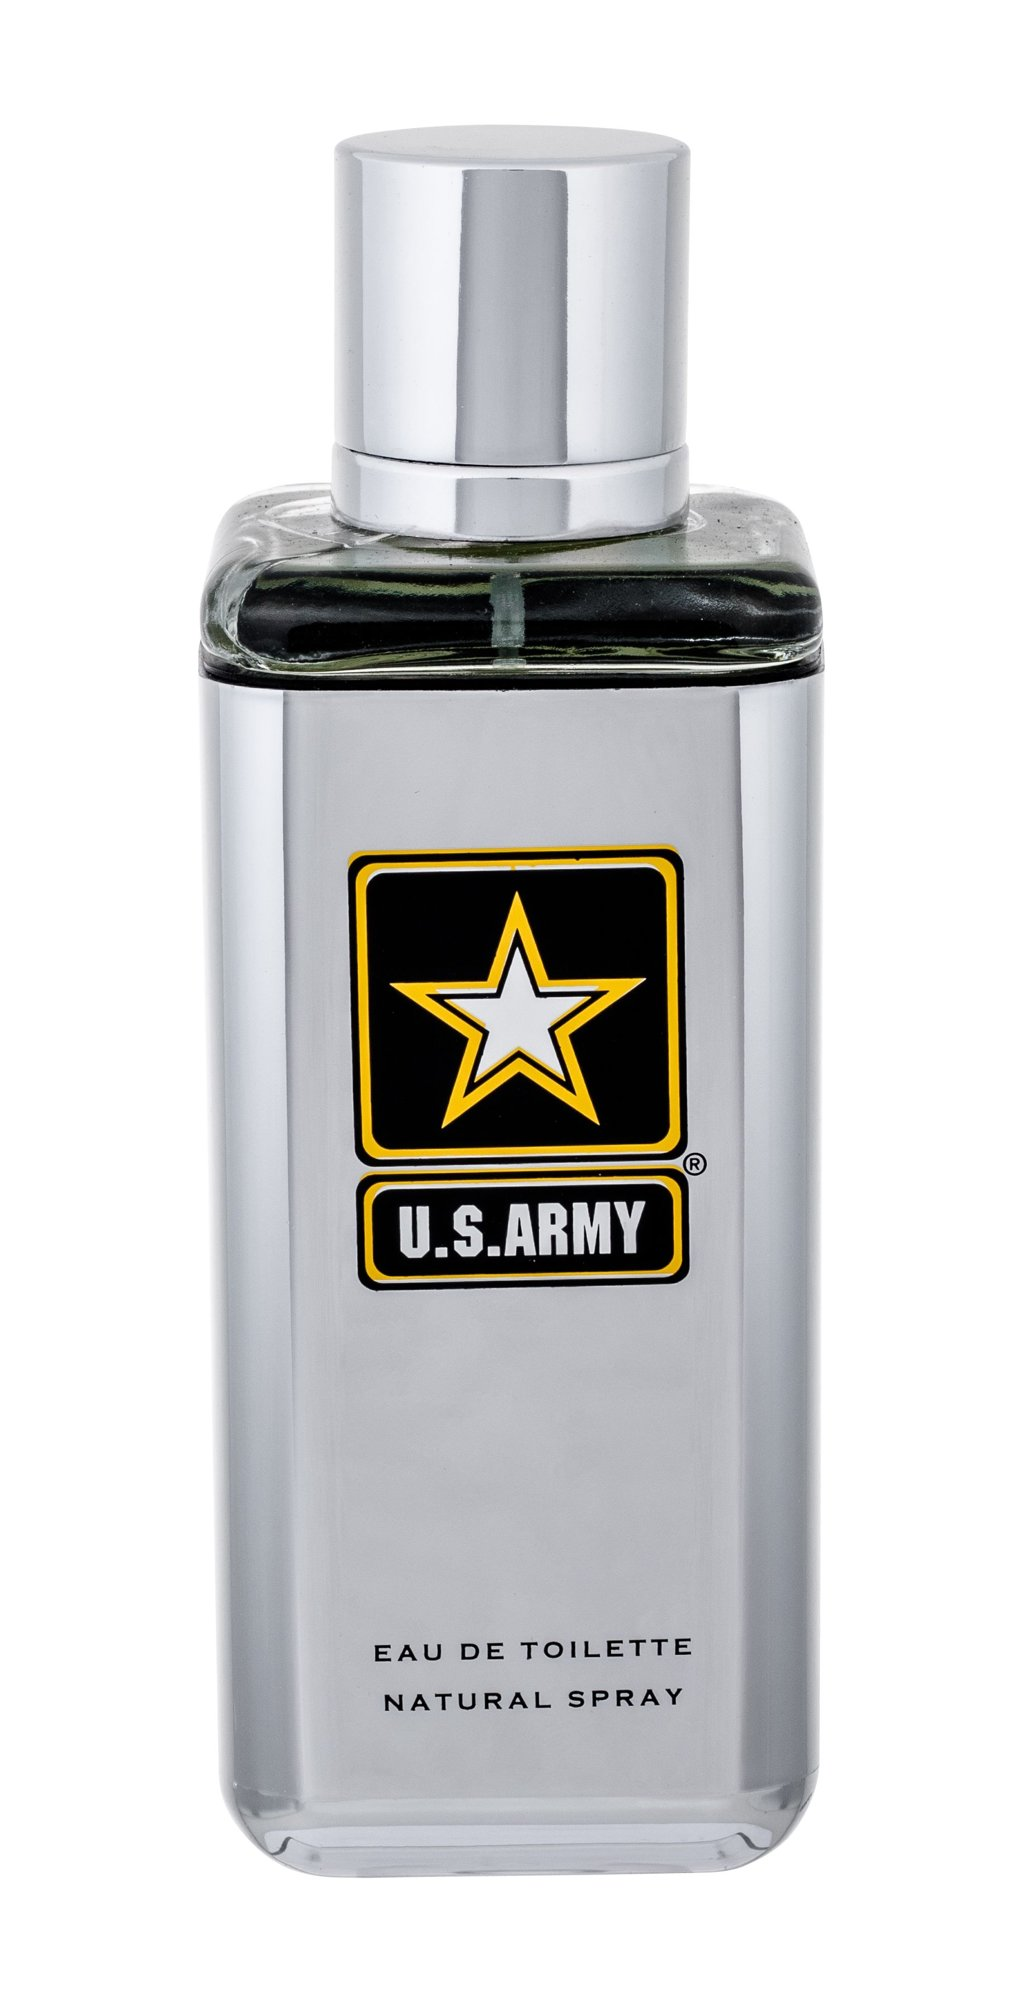 U.S.Army Silver